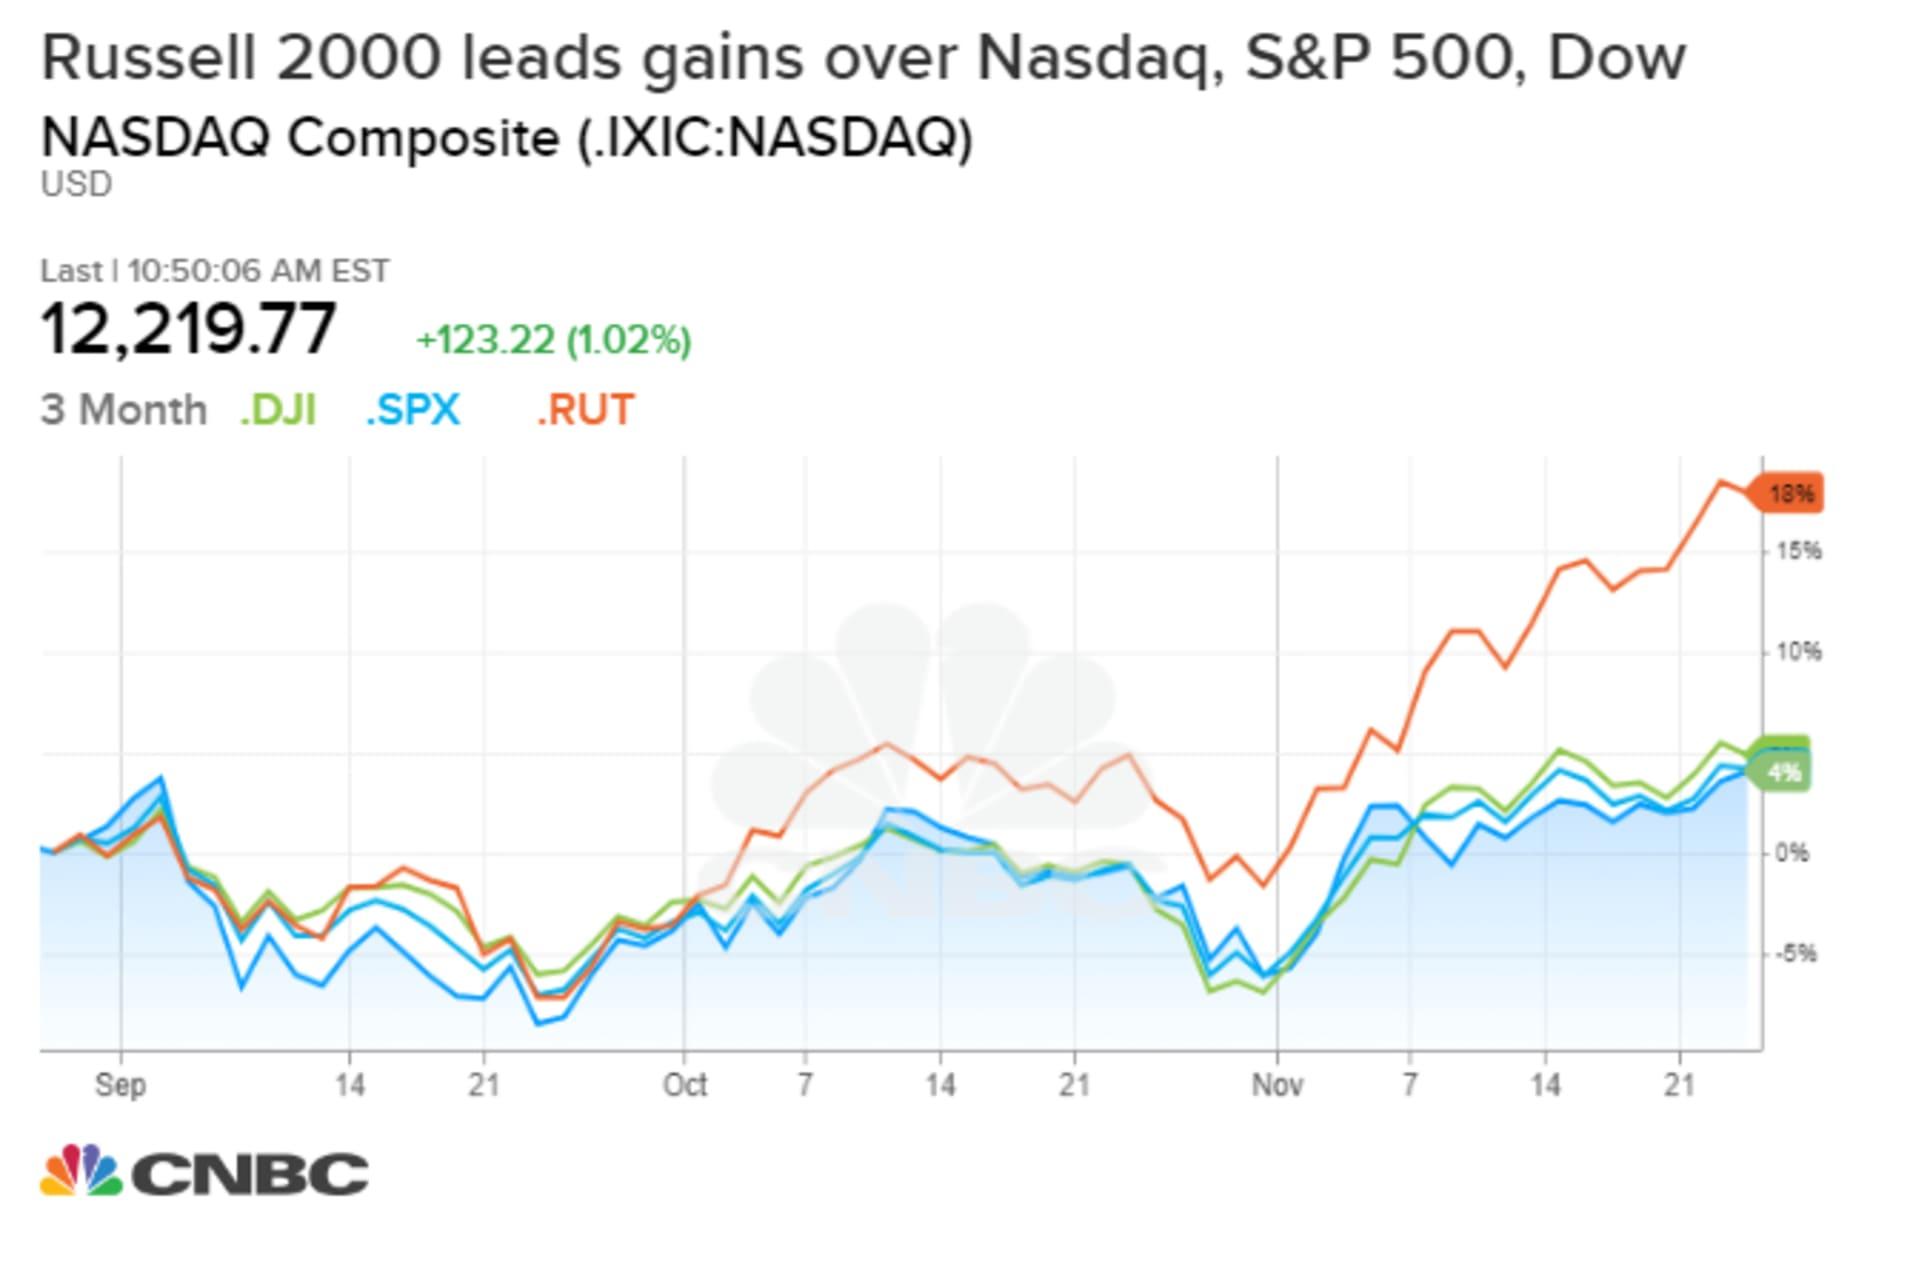 Индекс Russell 2000 значительно опережает DJI, S&P500 и Nasdaq